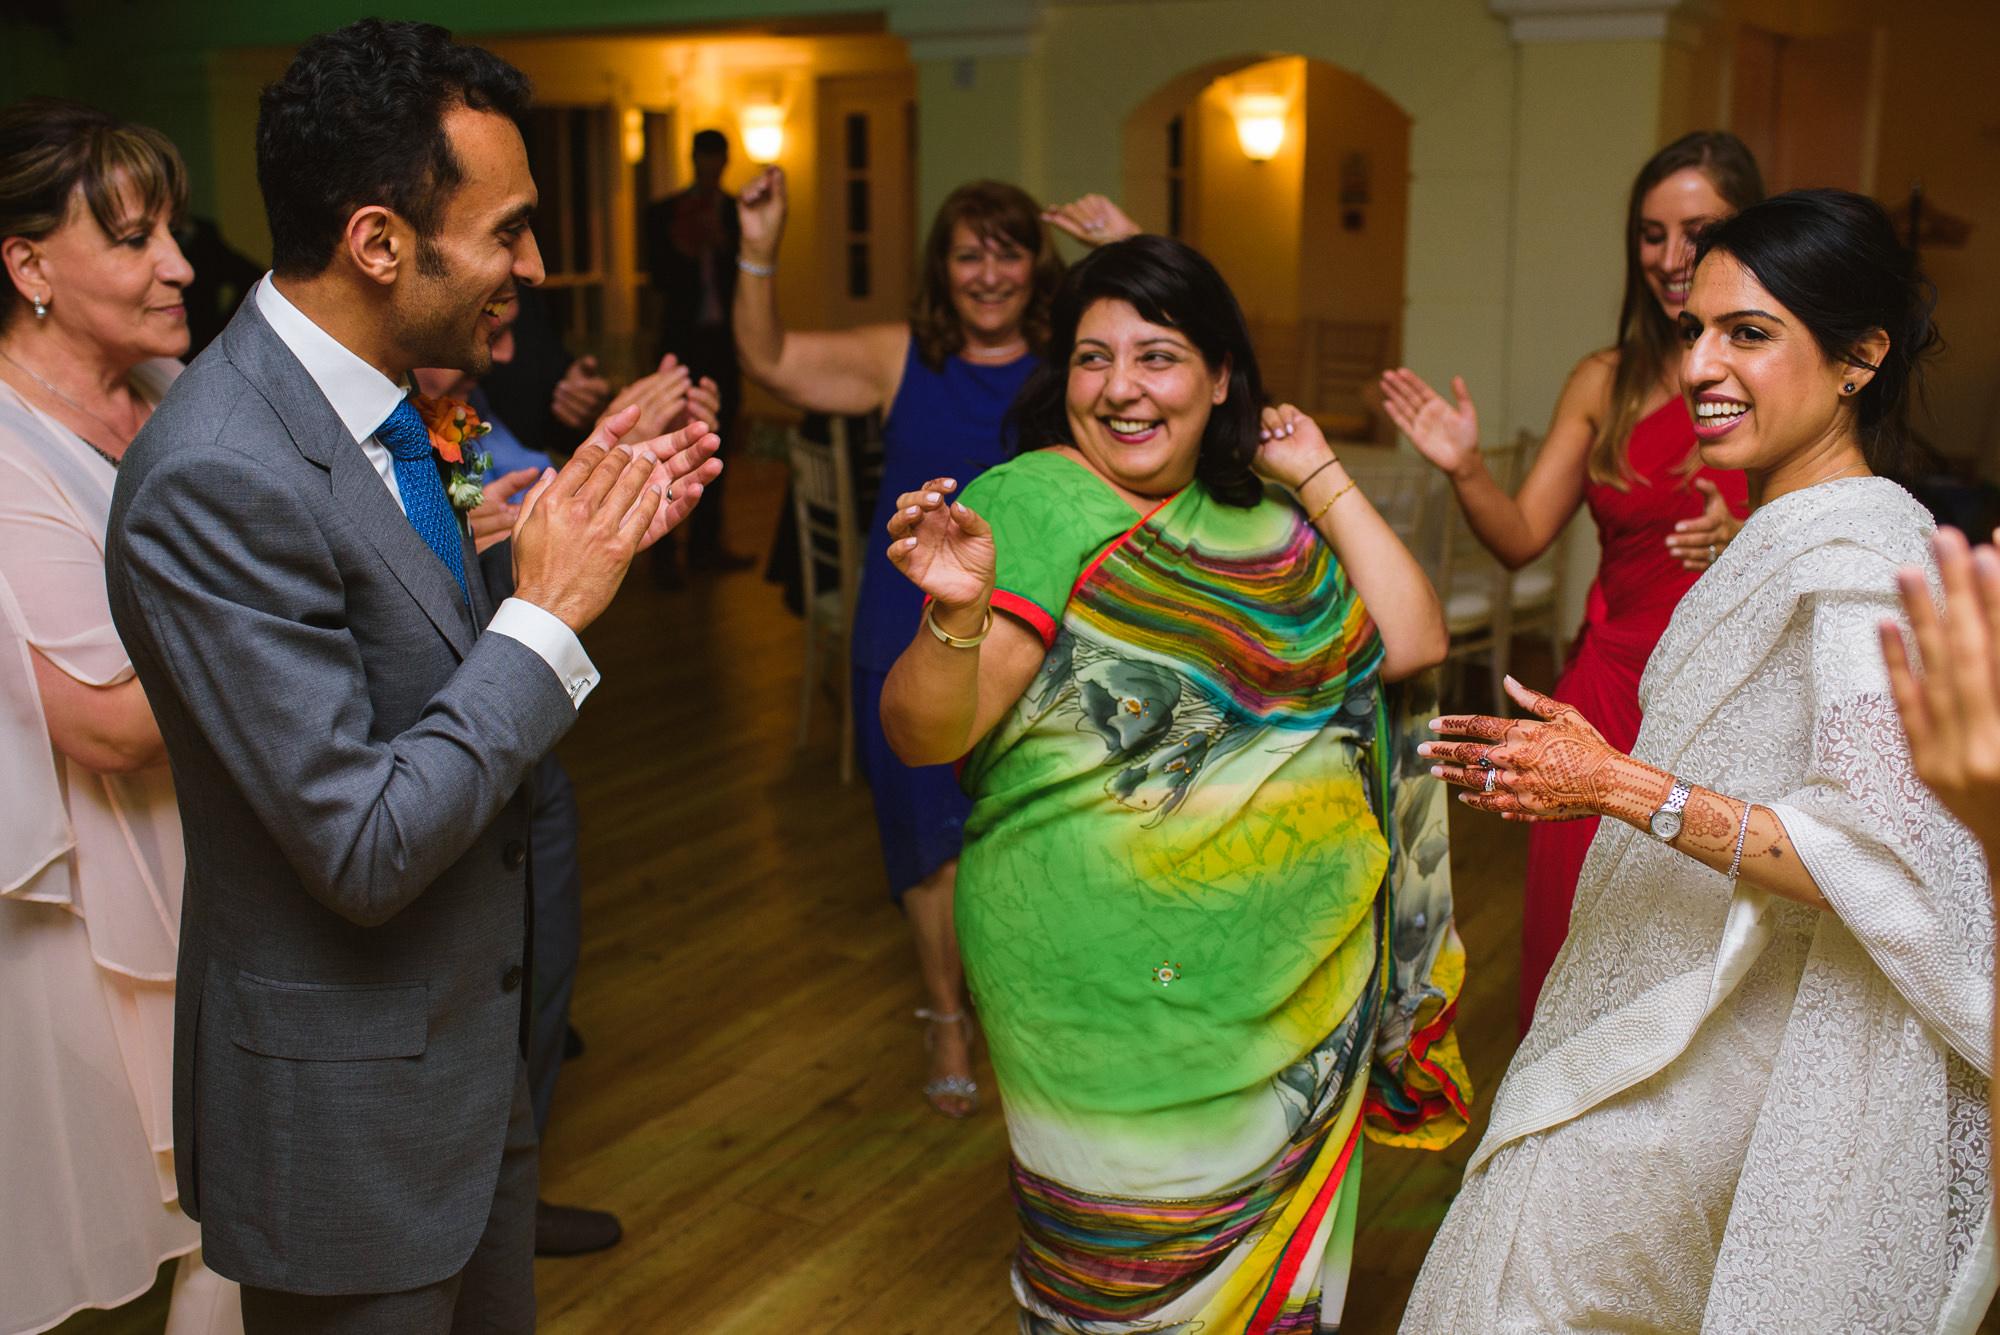 Pembroke lodge wedding celebration